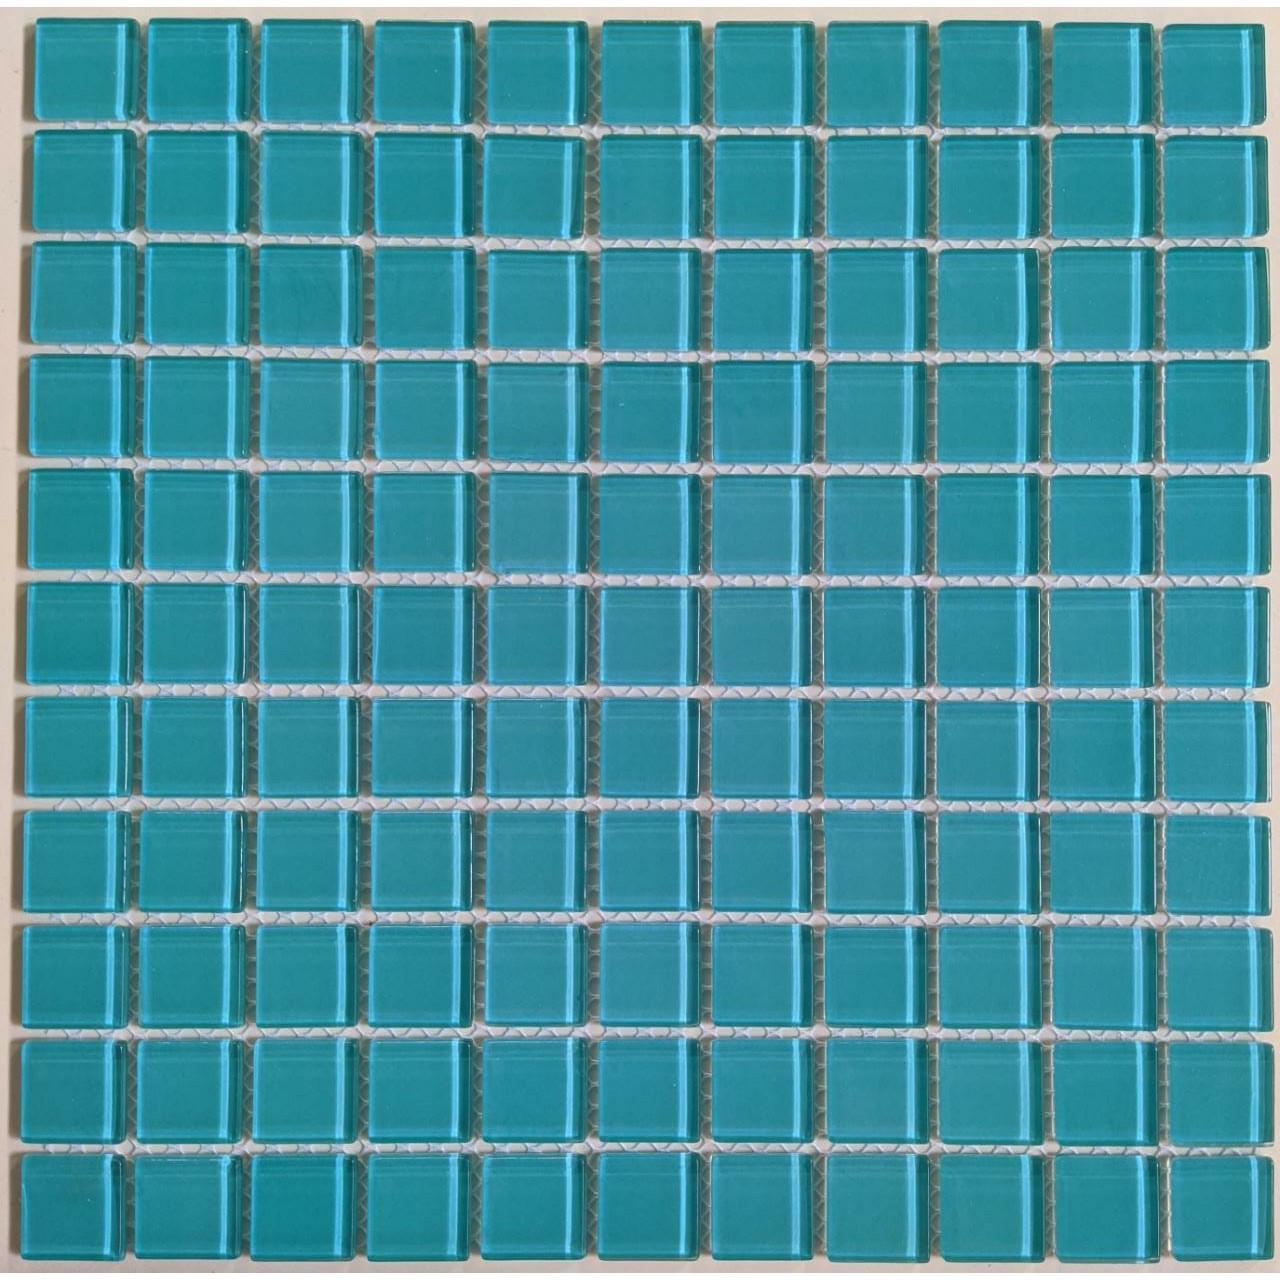 Pastilha de Vidro Blue Pool A017 30x30cm